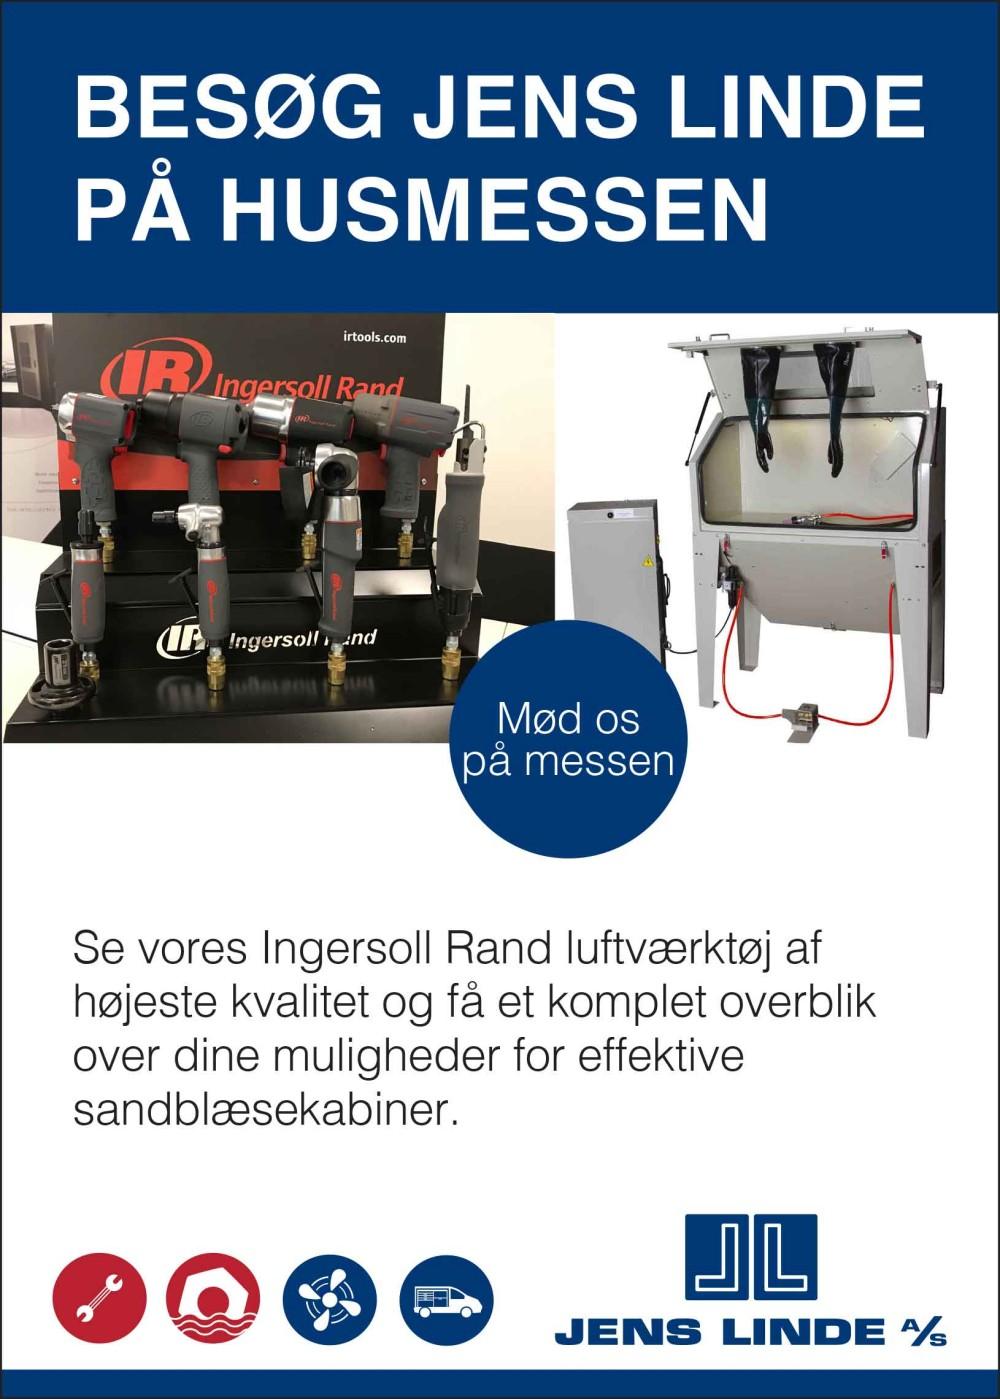 Auto-G Husmesse - Mød Jens Linde